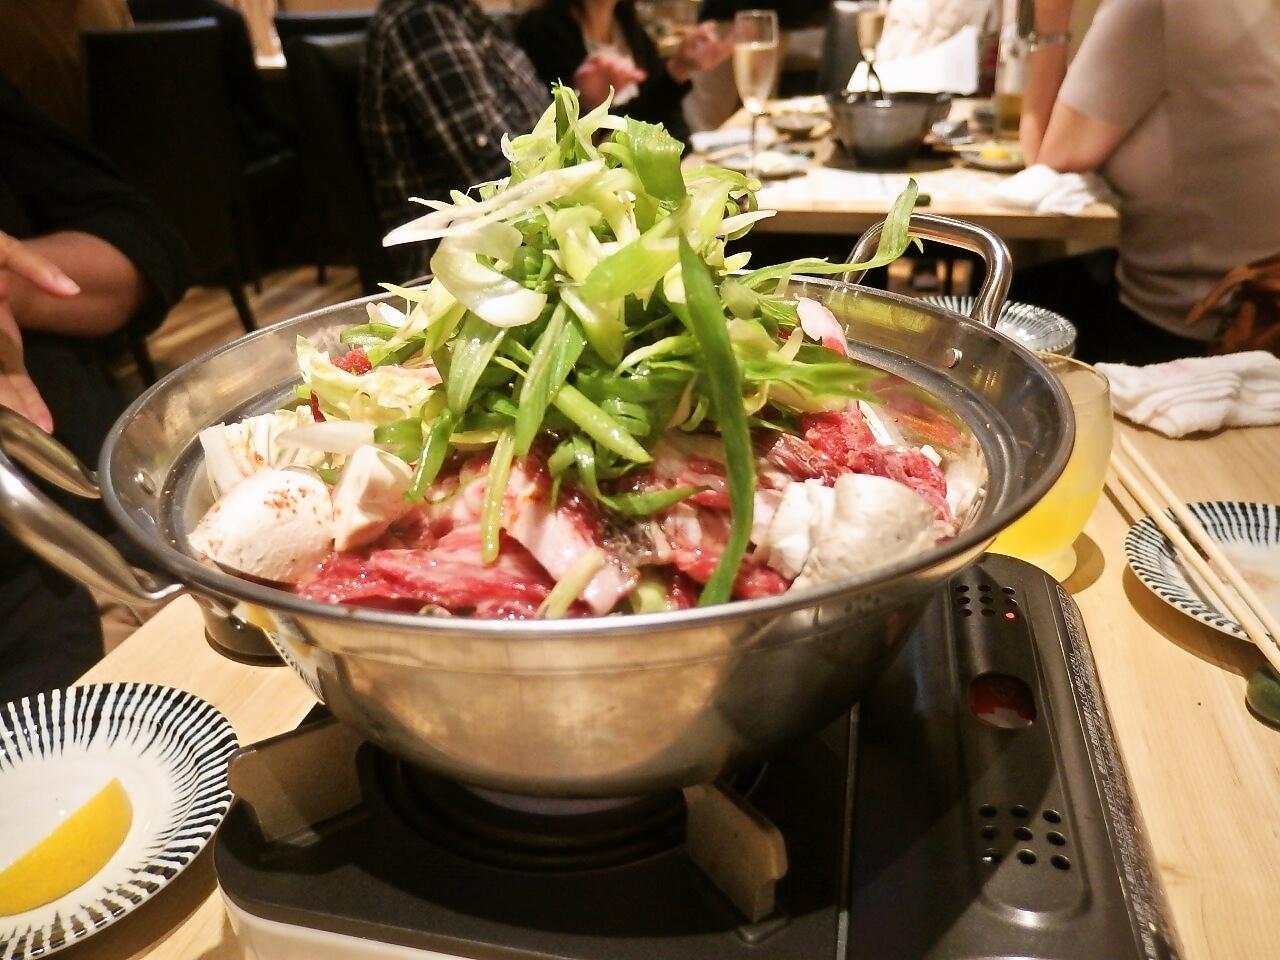 foodpic7918754.jpg